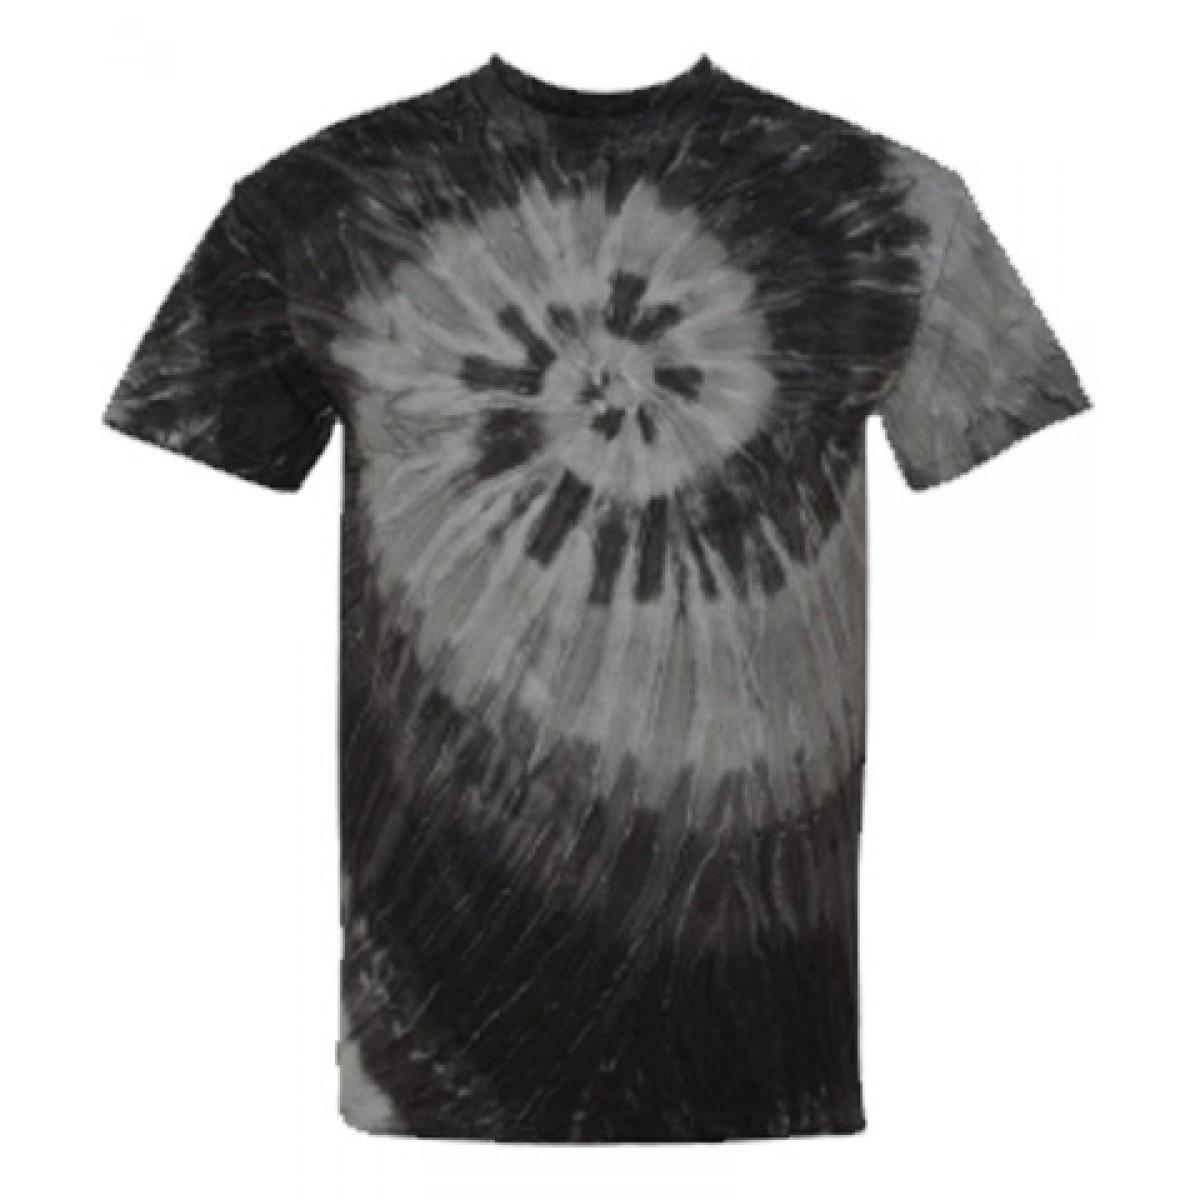 Blue or Black Ripple Tie Dye T-Shirt-White/Black-XL